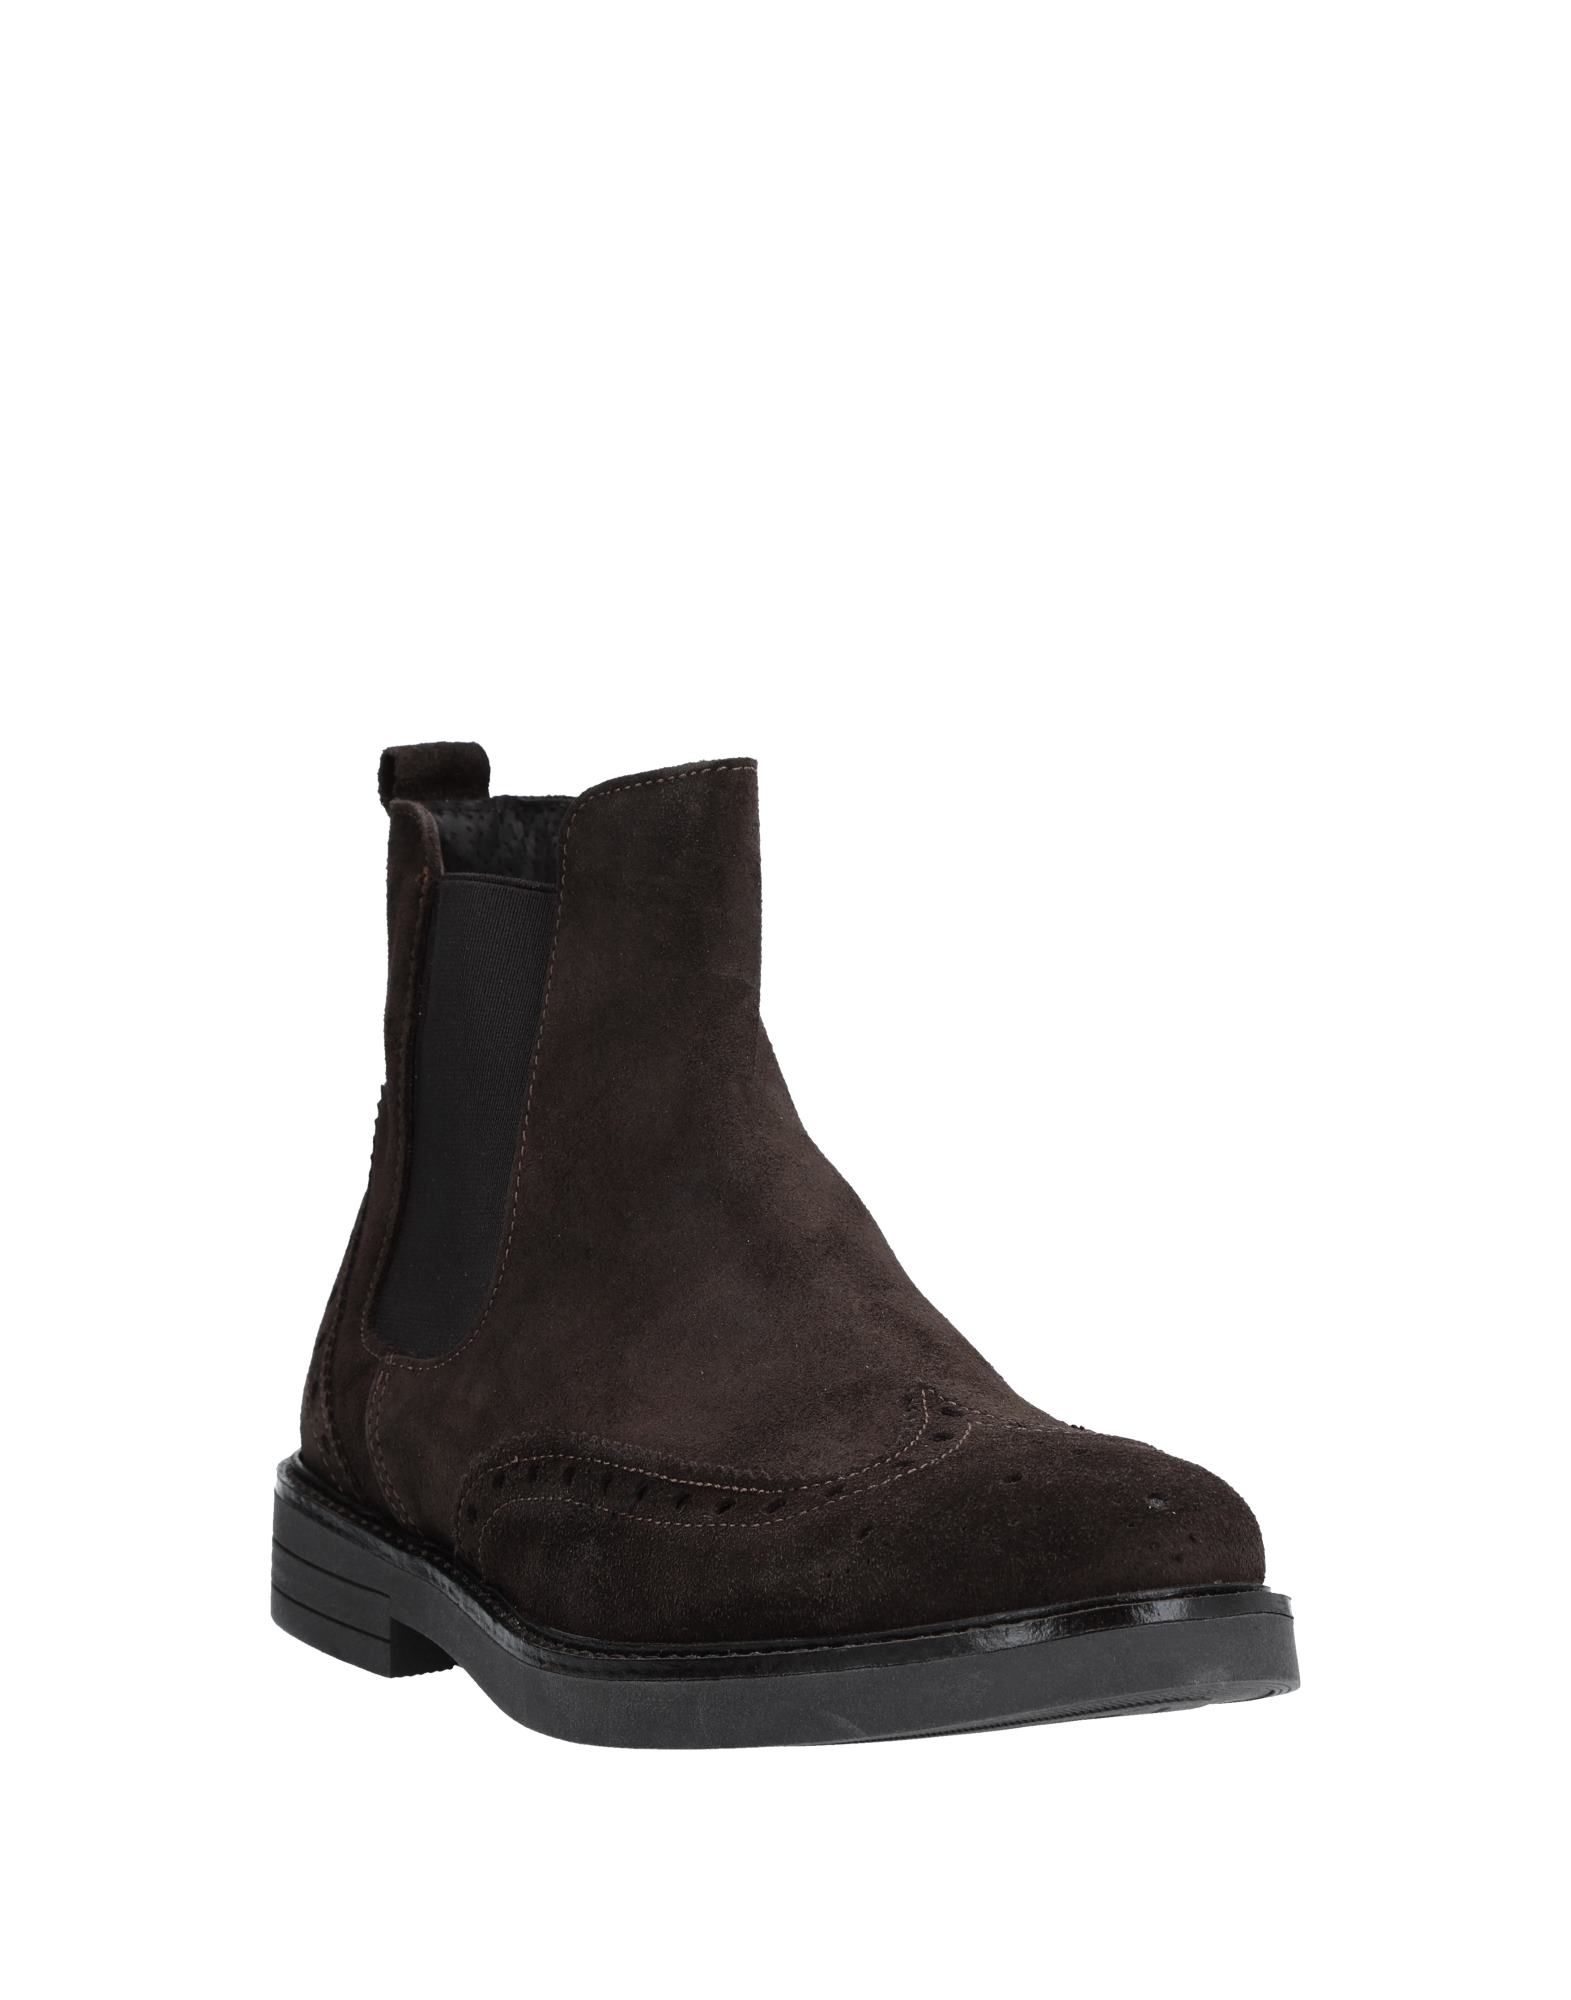 Roberto Della Croce Boots - Men Men Men Roberto Della Croce Boots online on  Canada - 11531545JJ f7c386